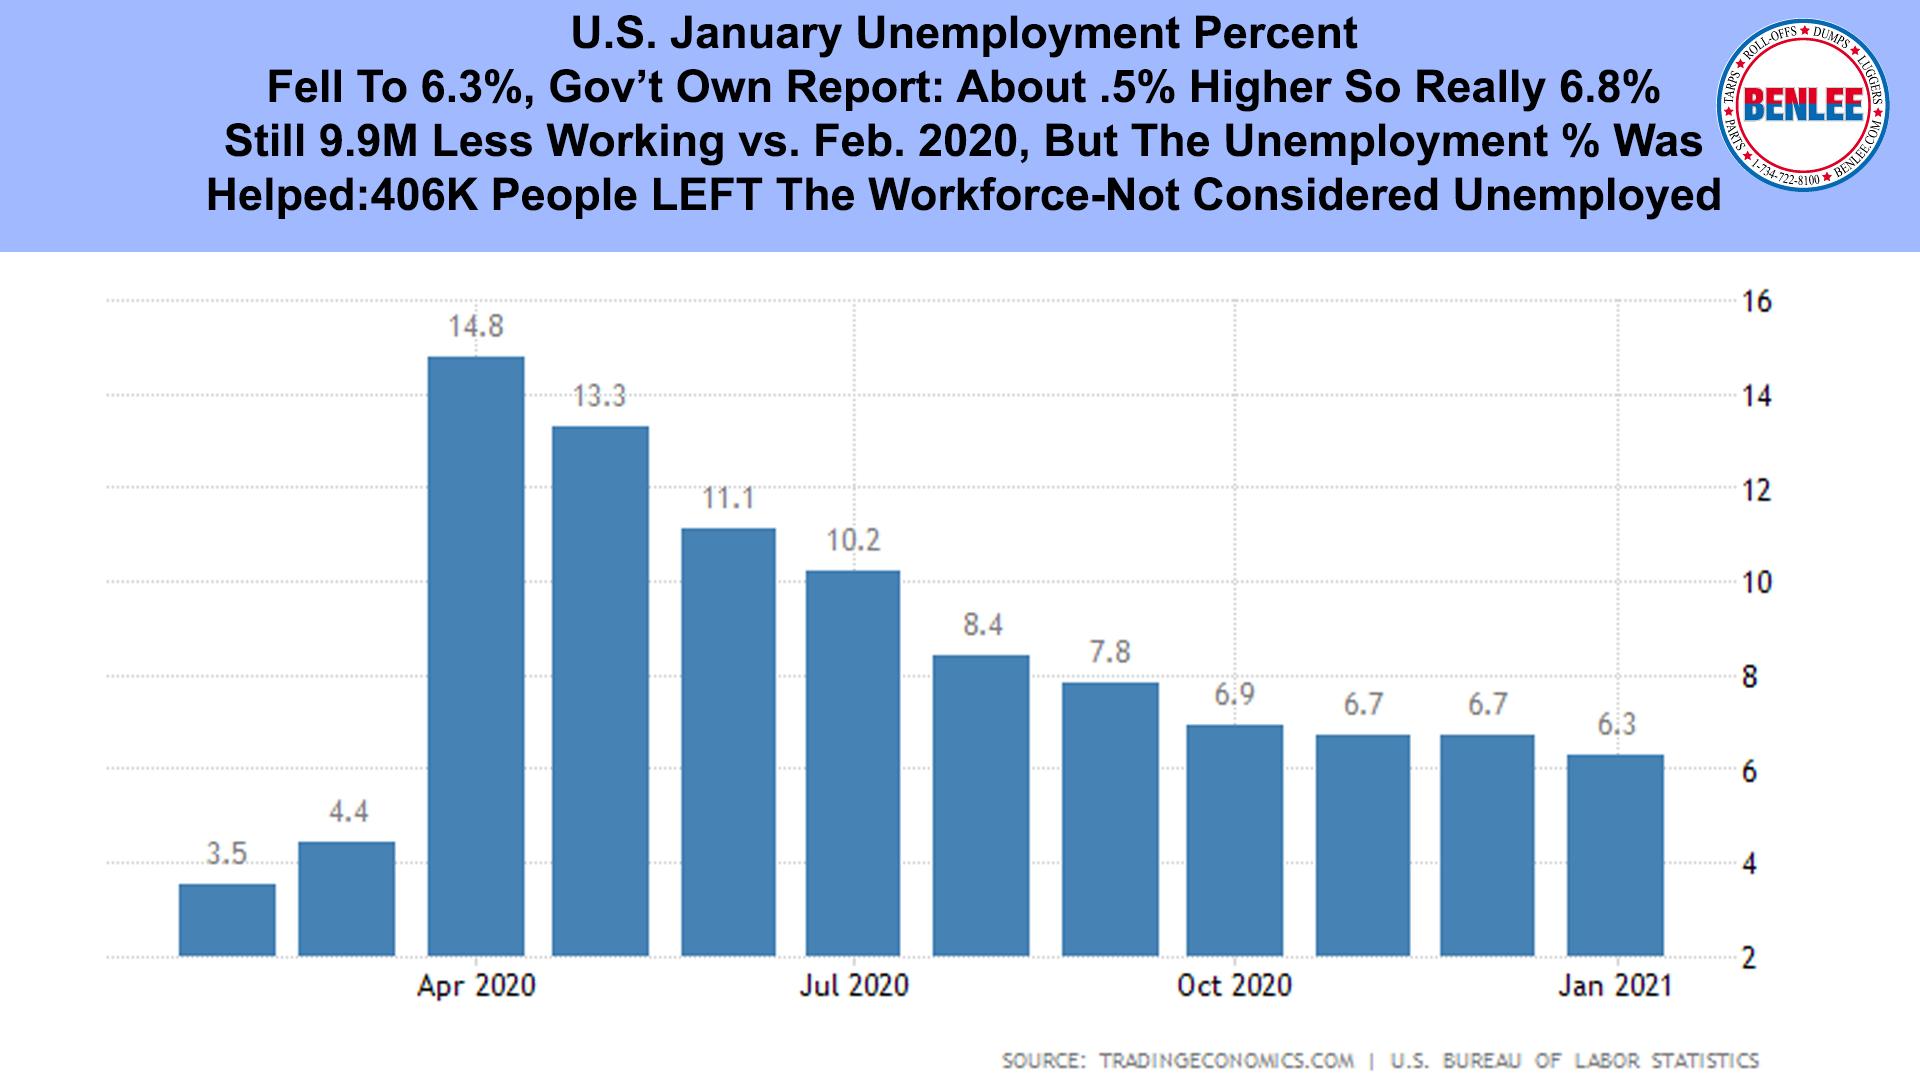 U.S. January Unemployment Percent